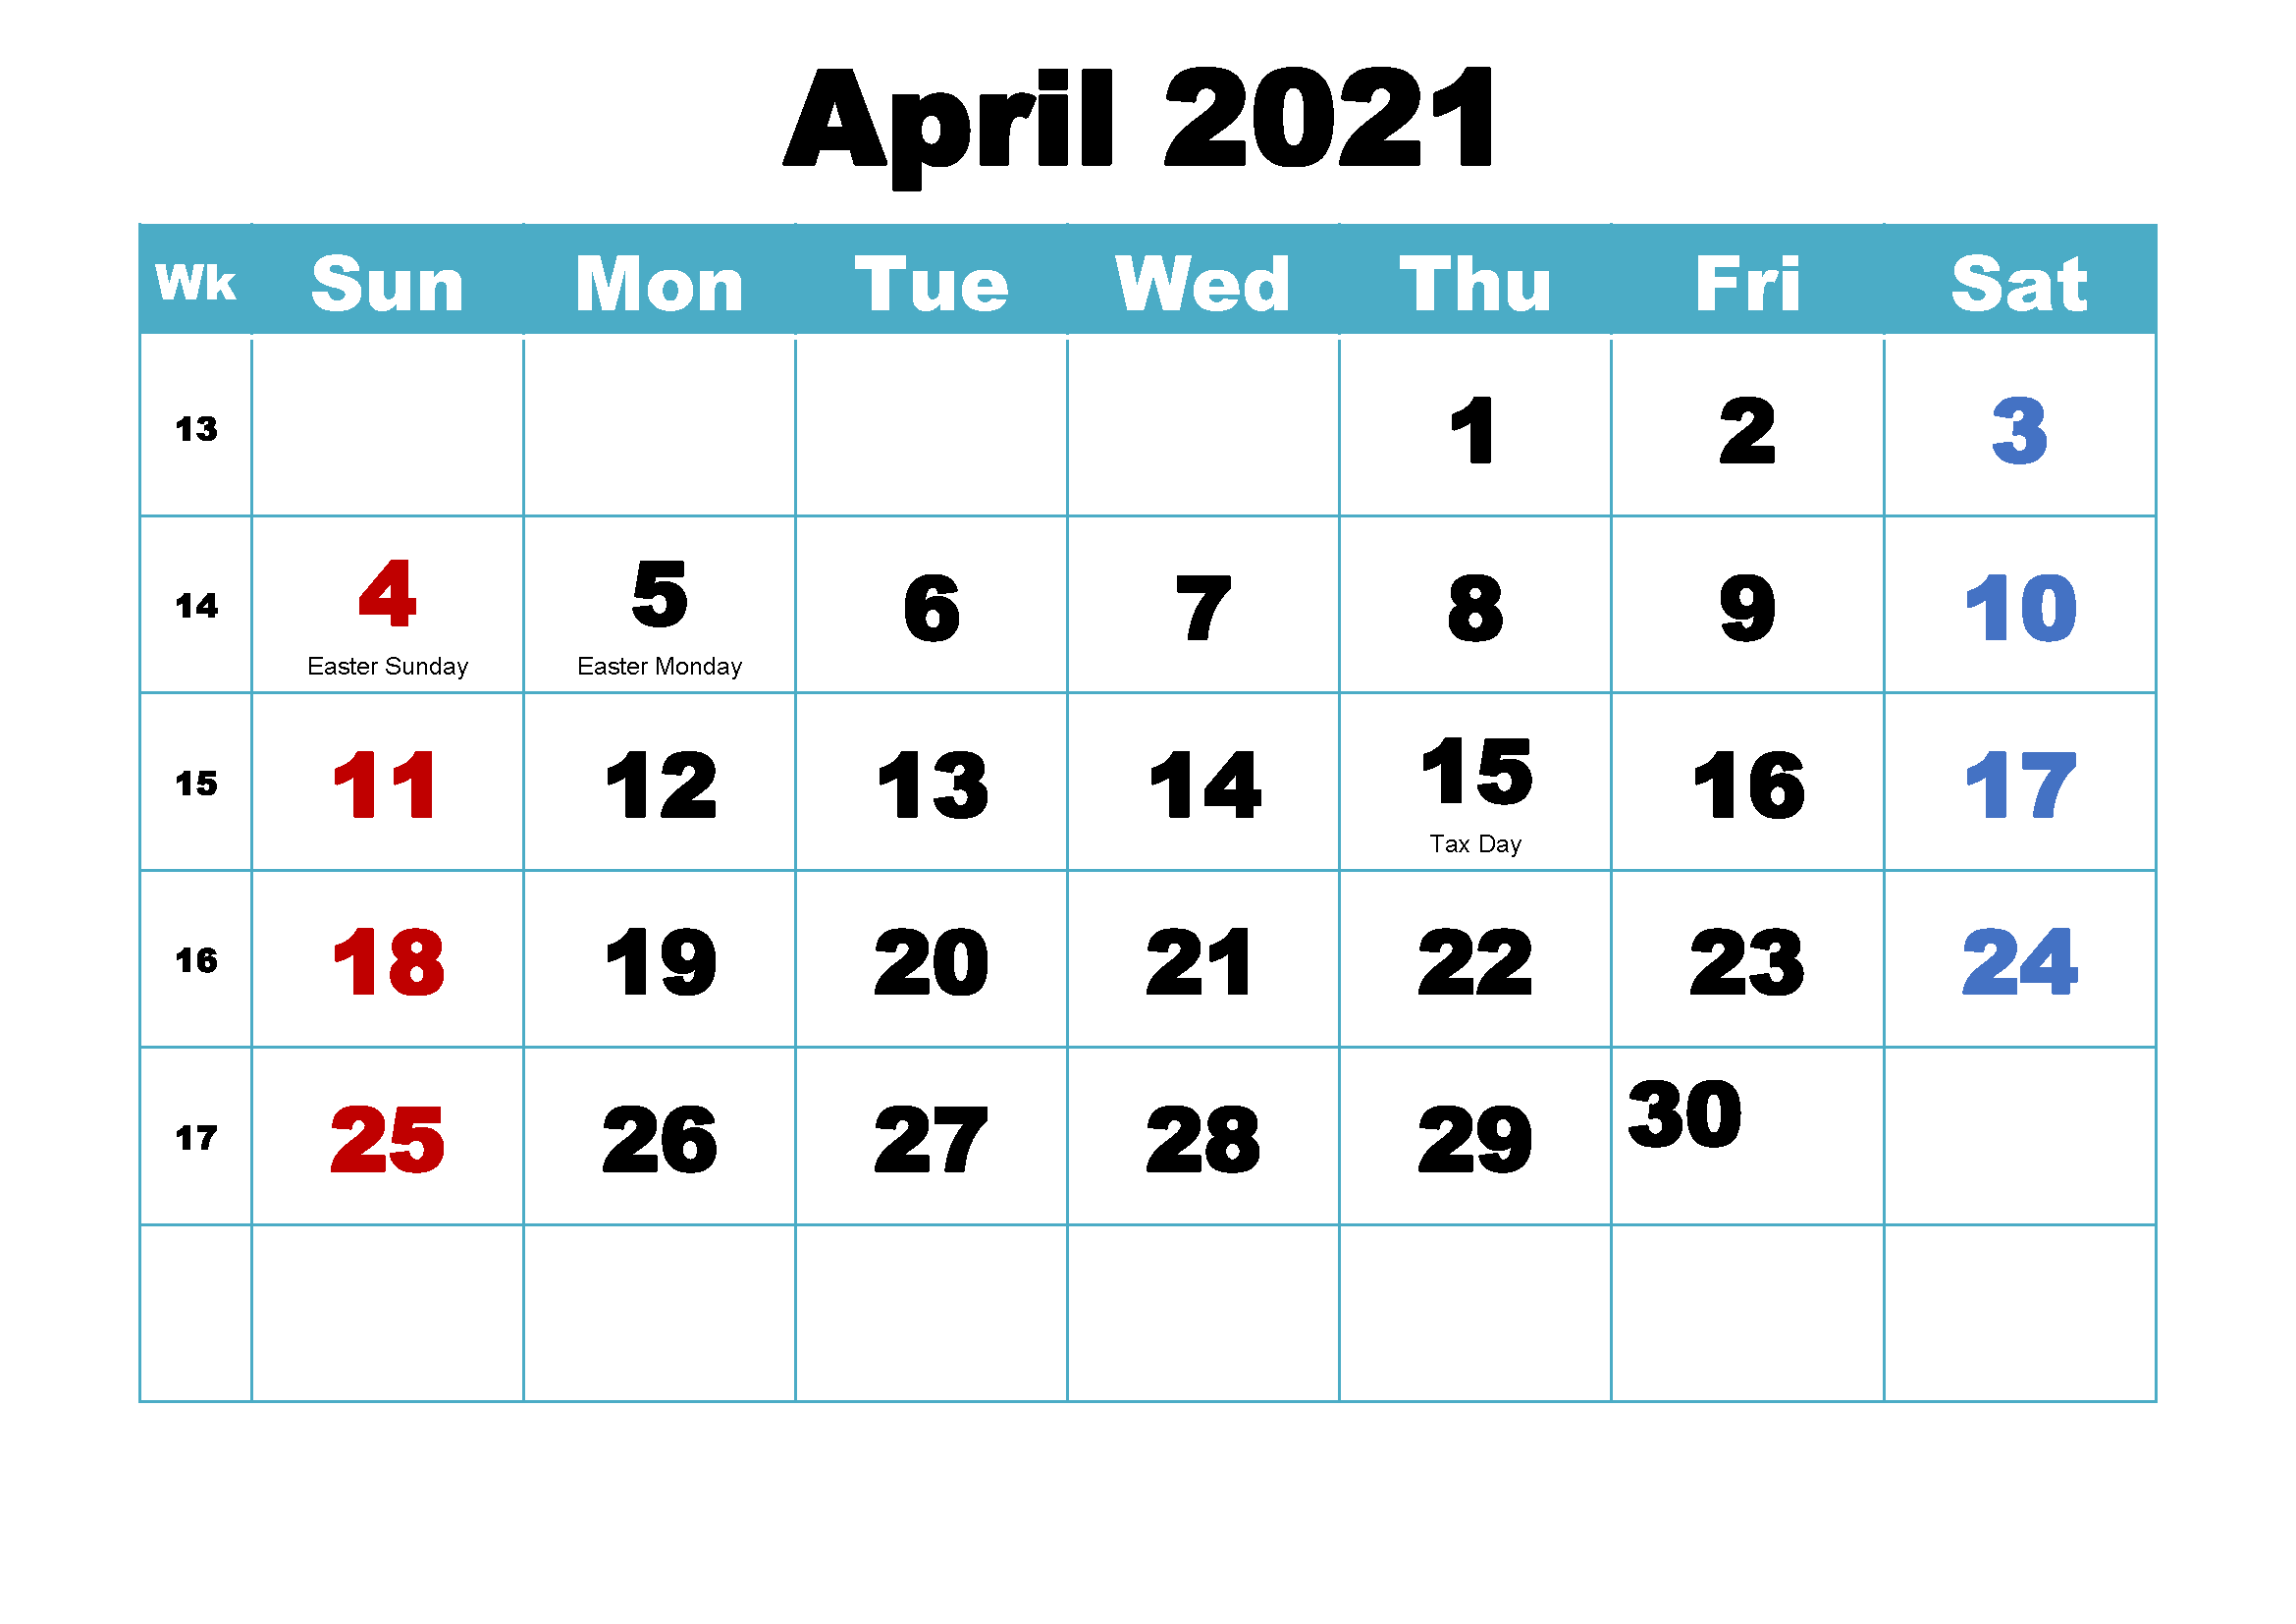 April 2021 Holidays Calendar